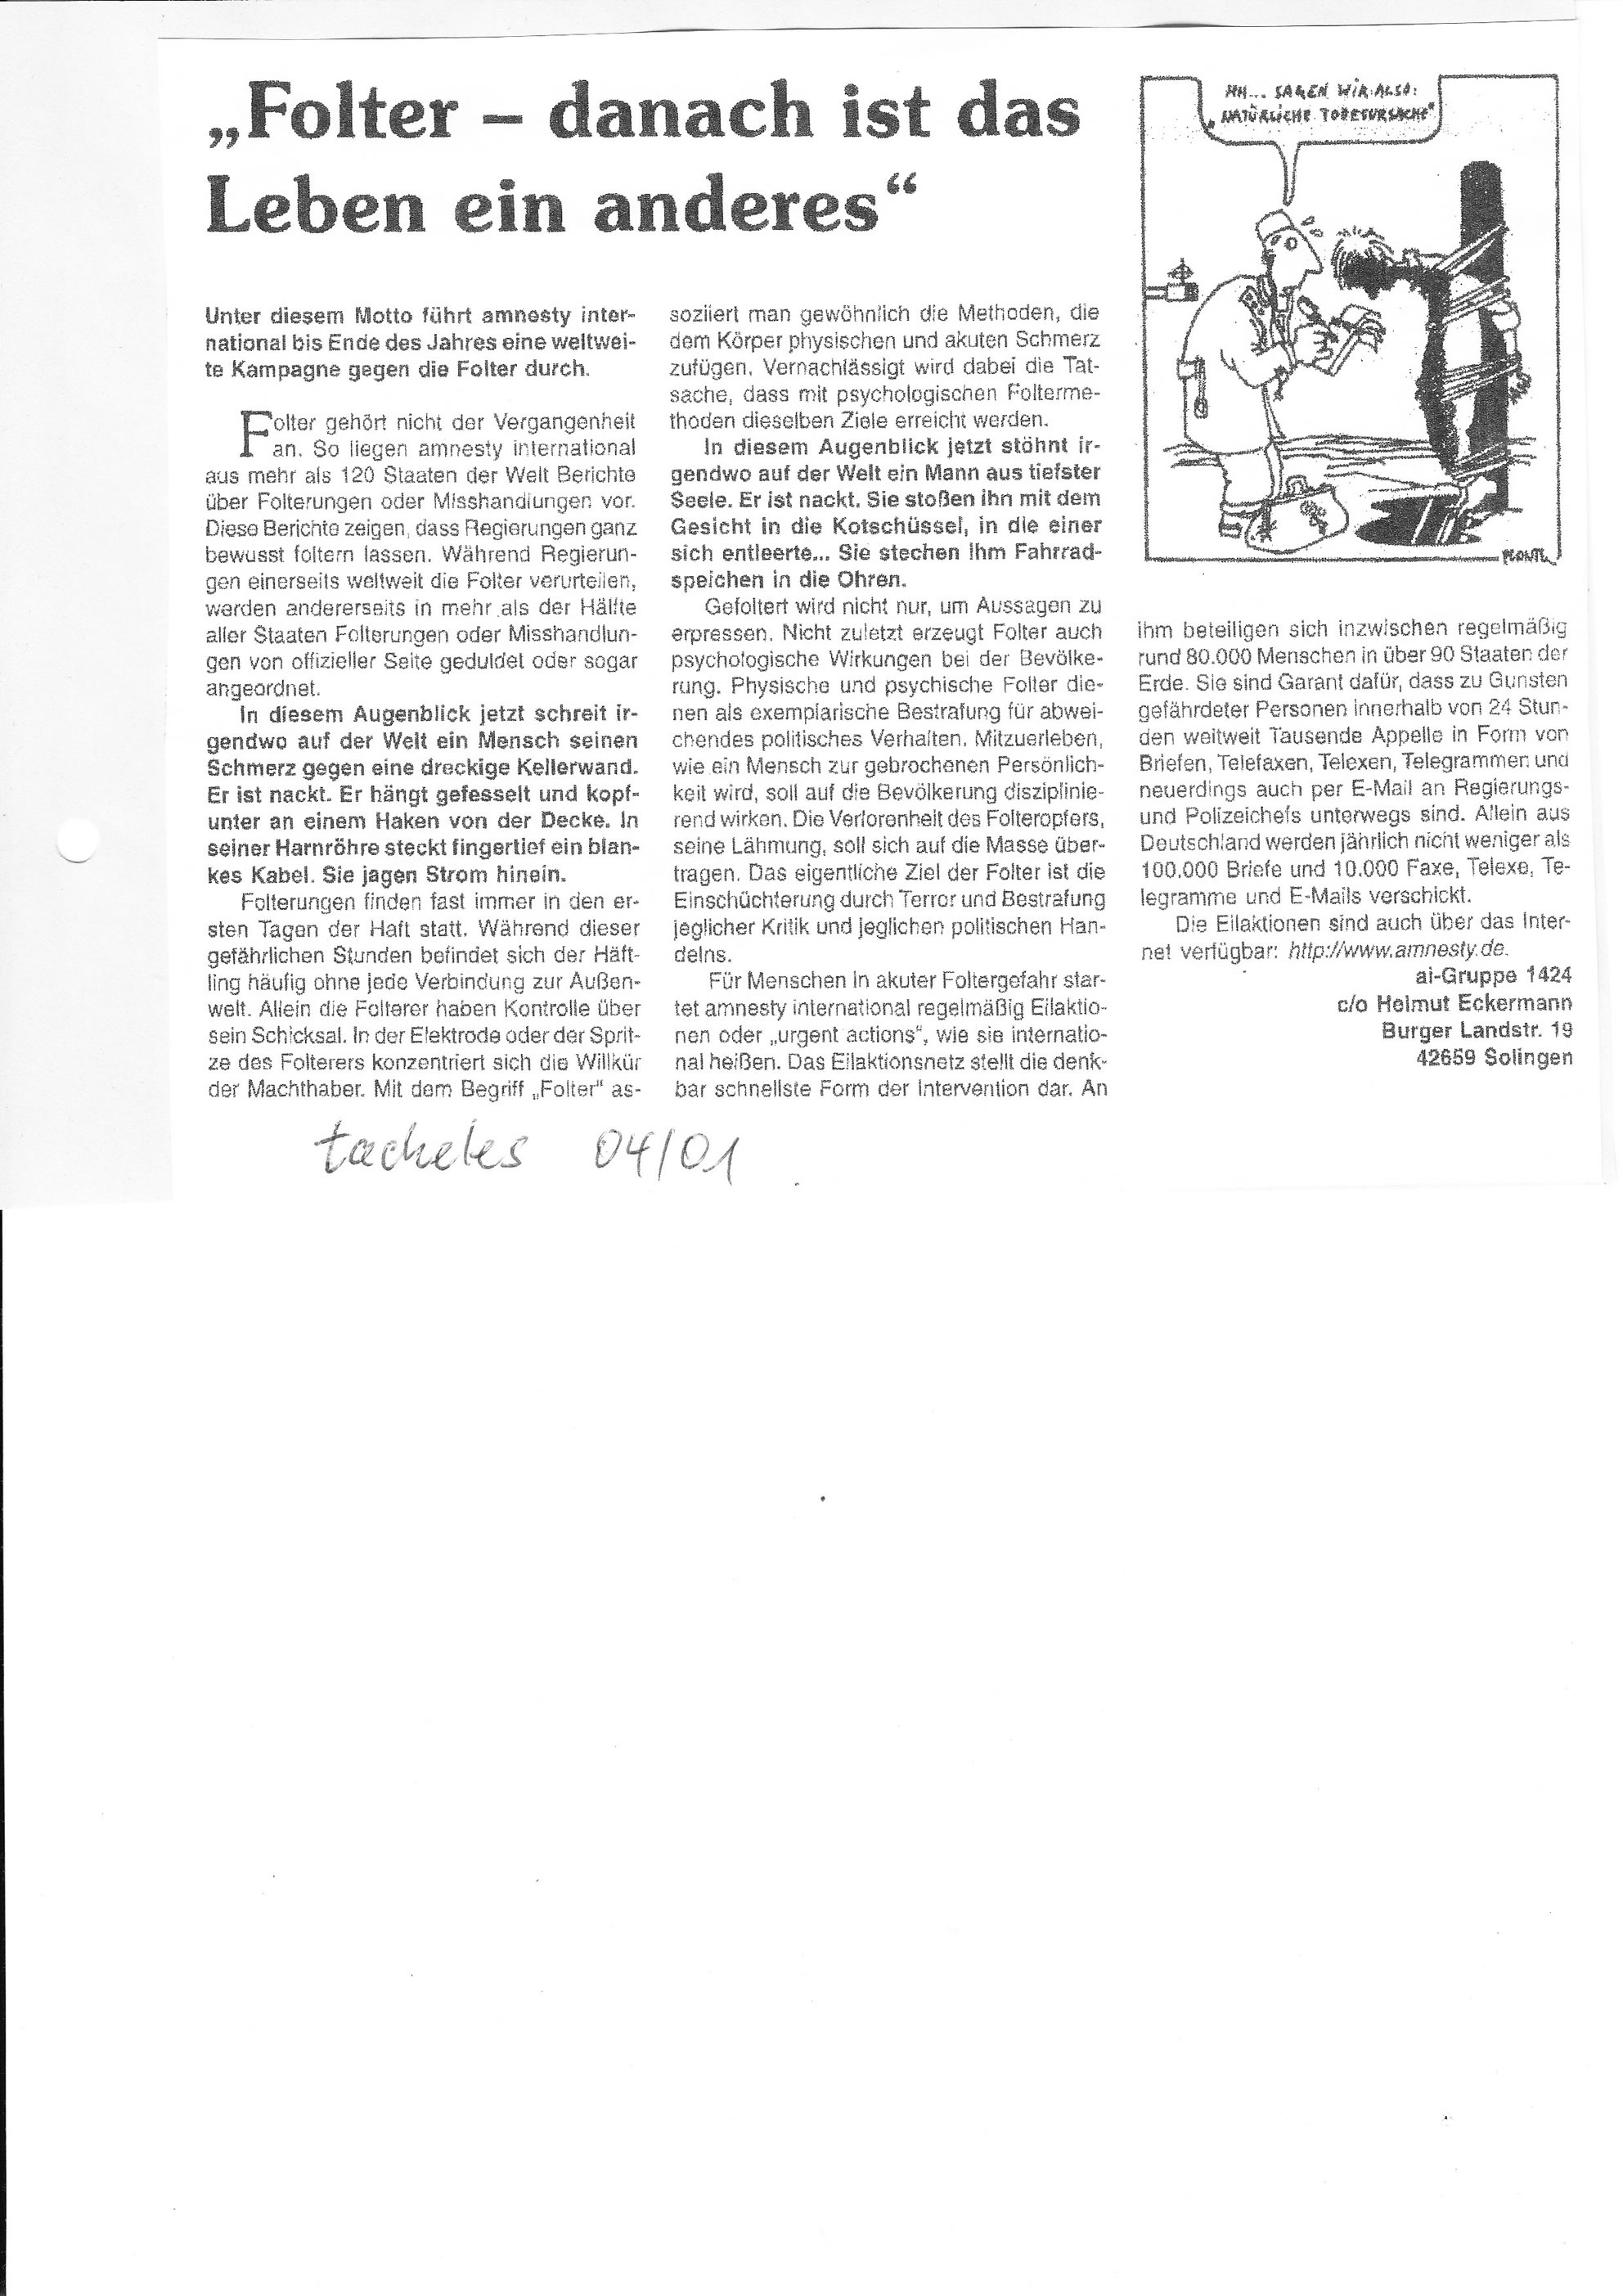 Tacheles 04/01: Anti-Folter-Kampagne